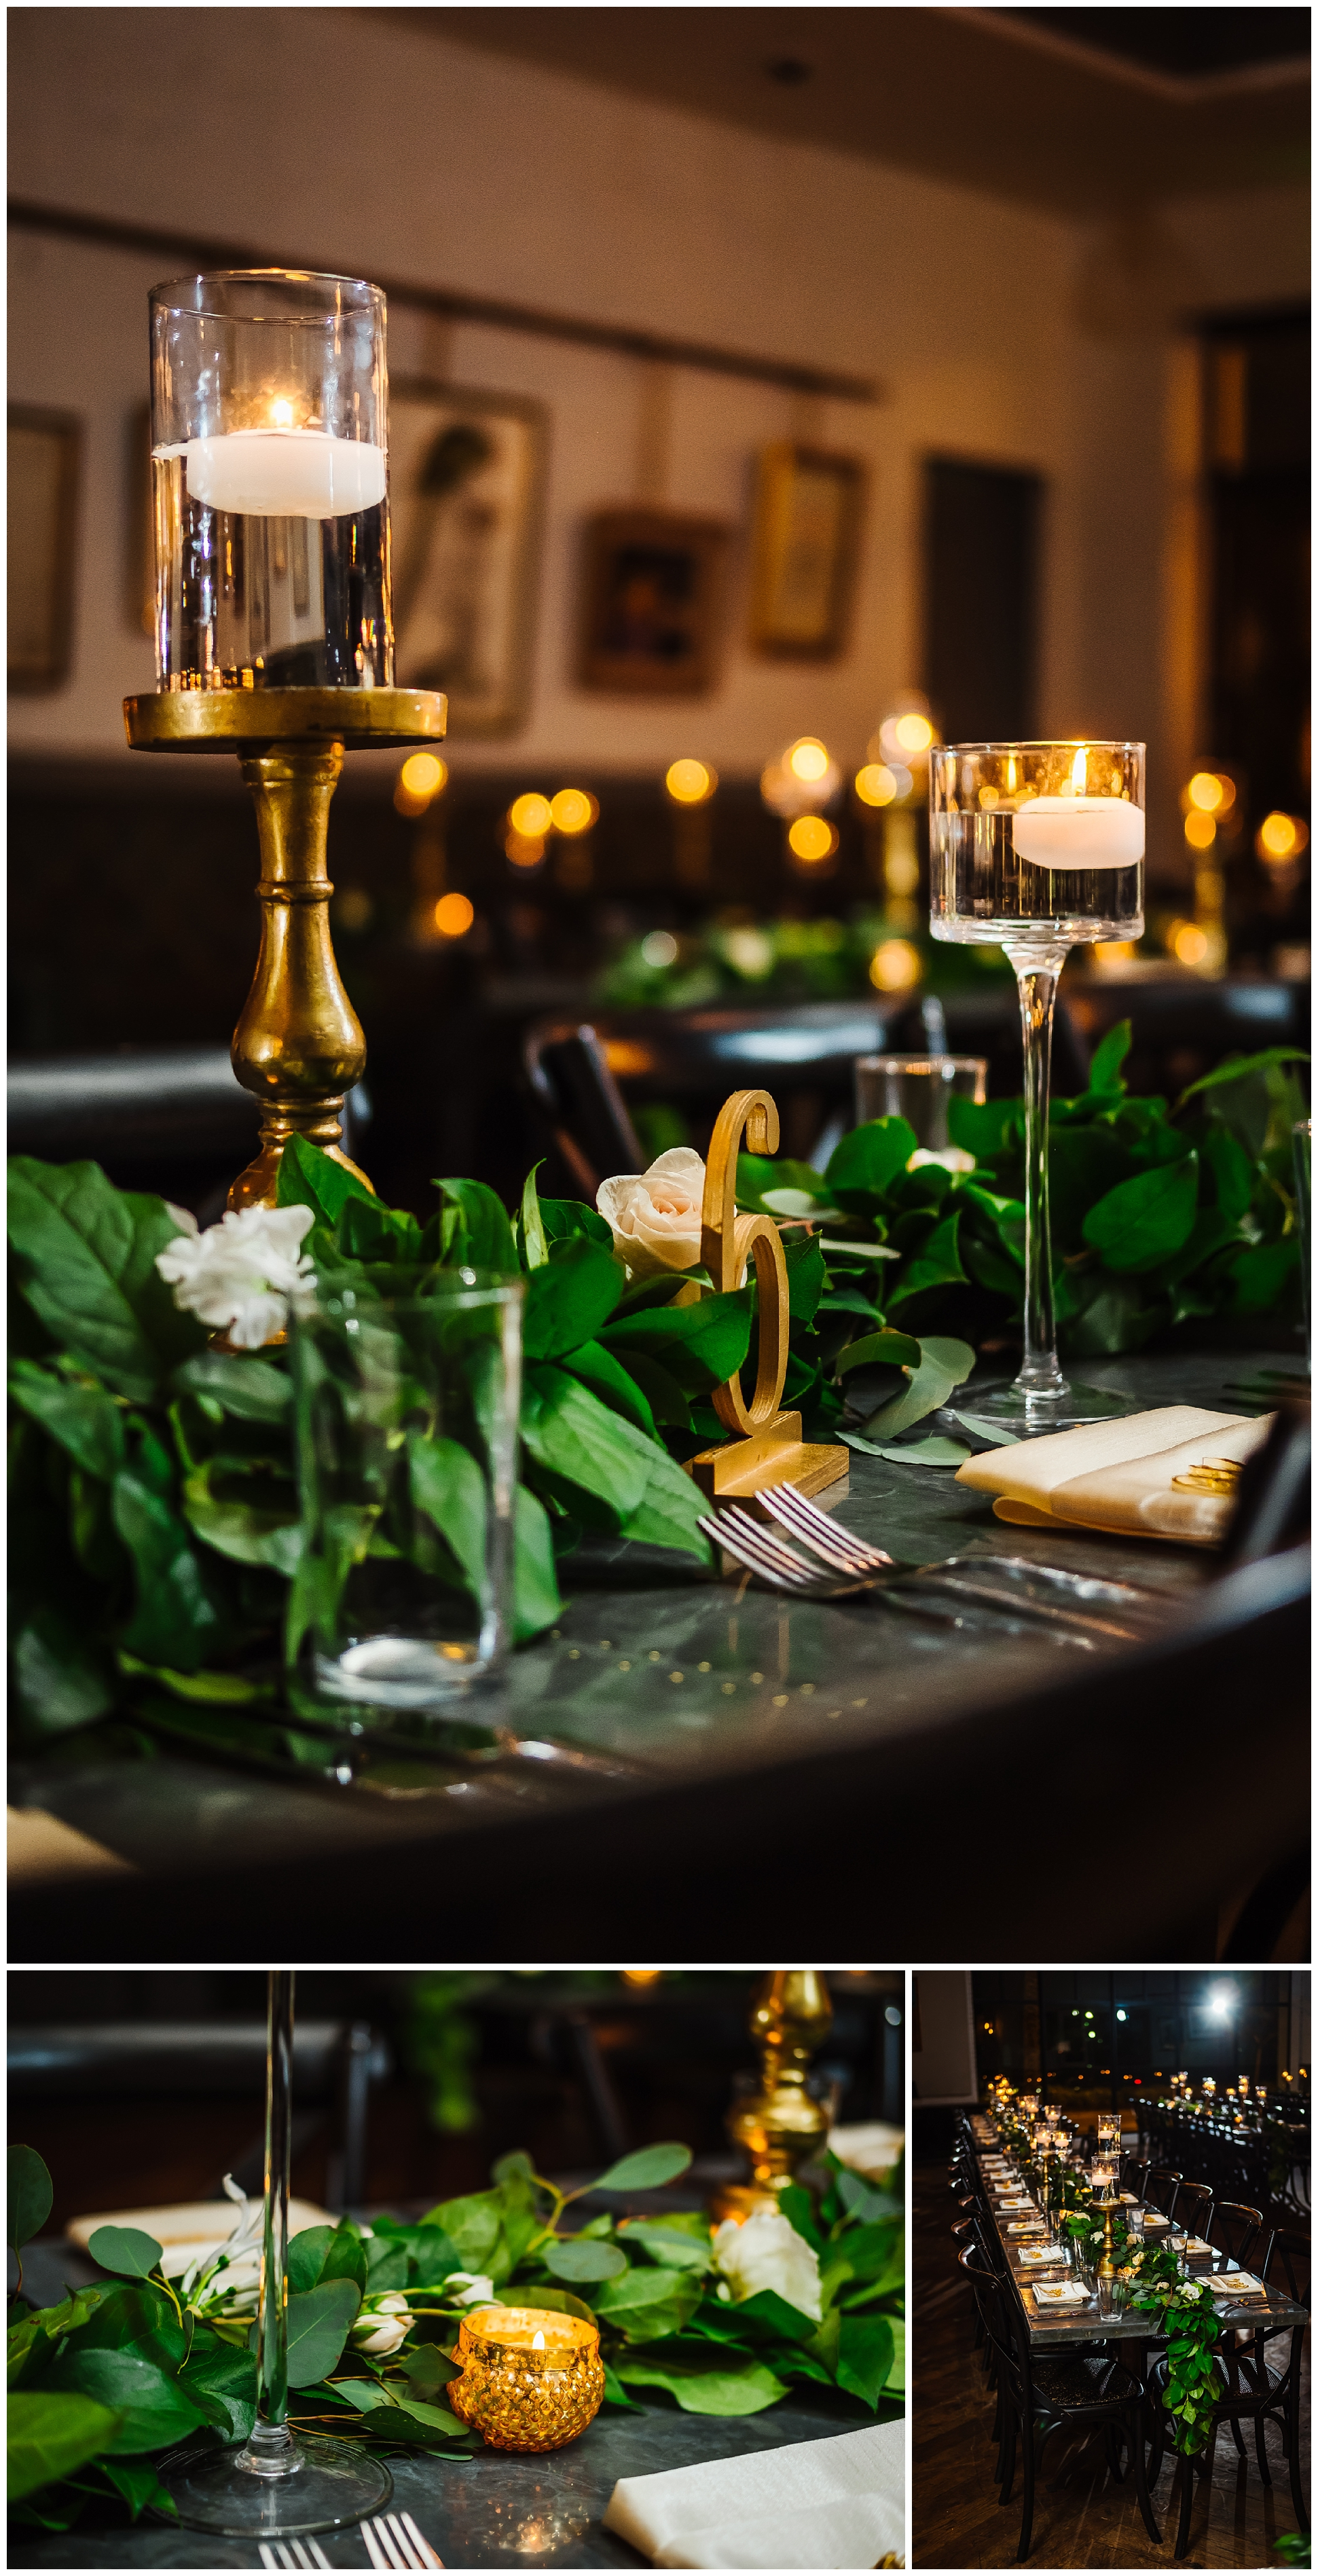 tampa-wedding-photographer-oxford-exchange-garland-candlelight-gold-hayley-paige_0050.jpg